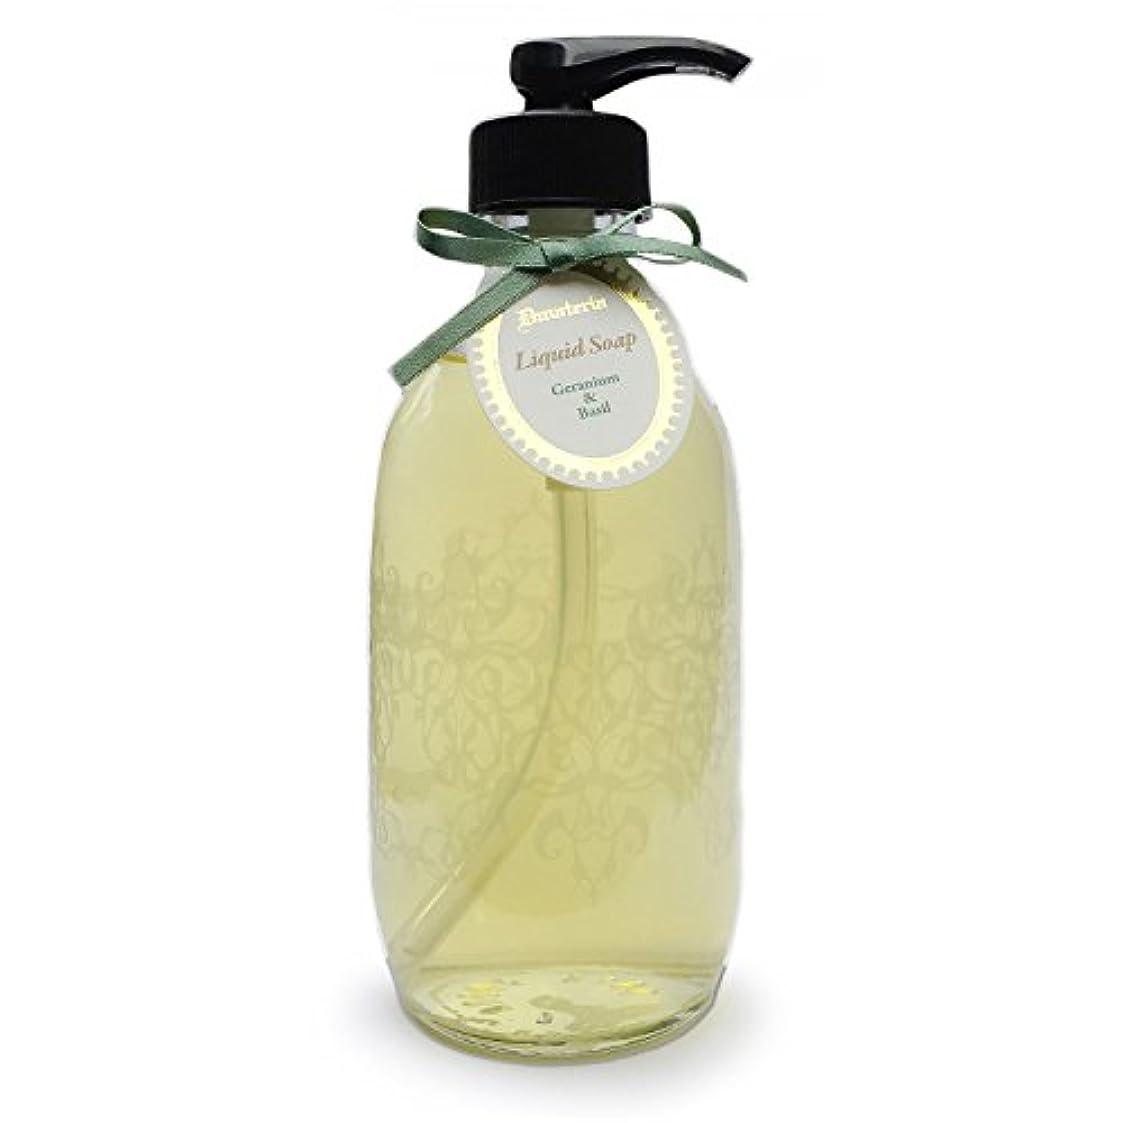 D materia リキッドソープ ゼラニウム&バジル Geranium&Basil Liquid Soap ディーマテリア